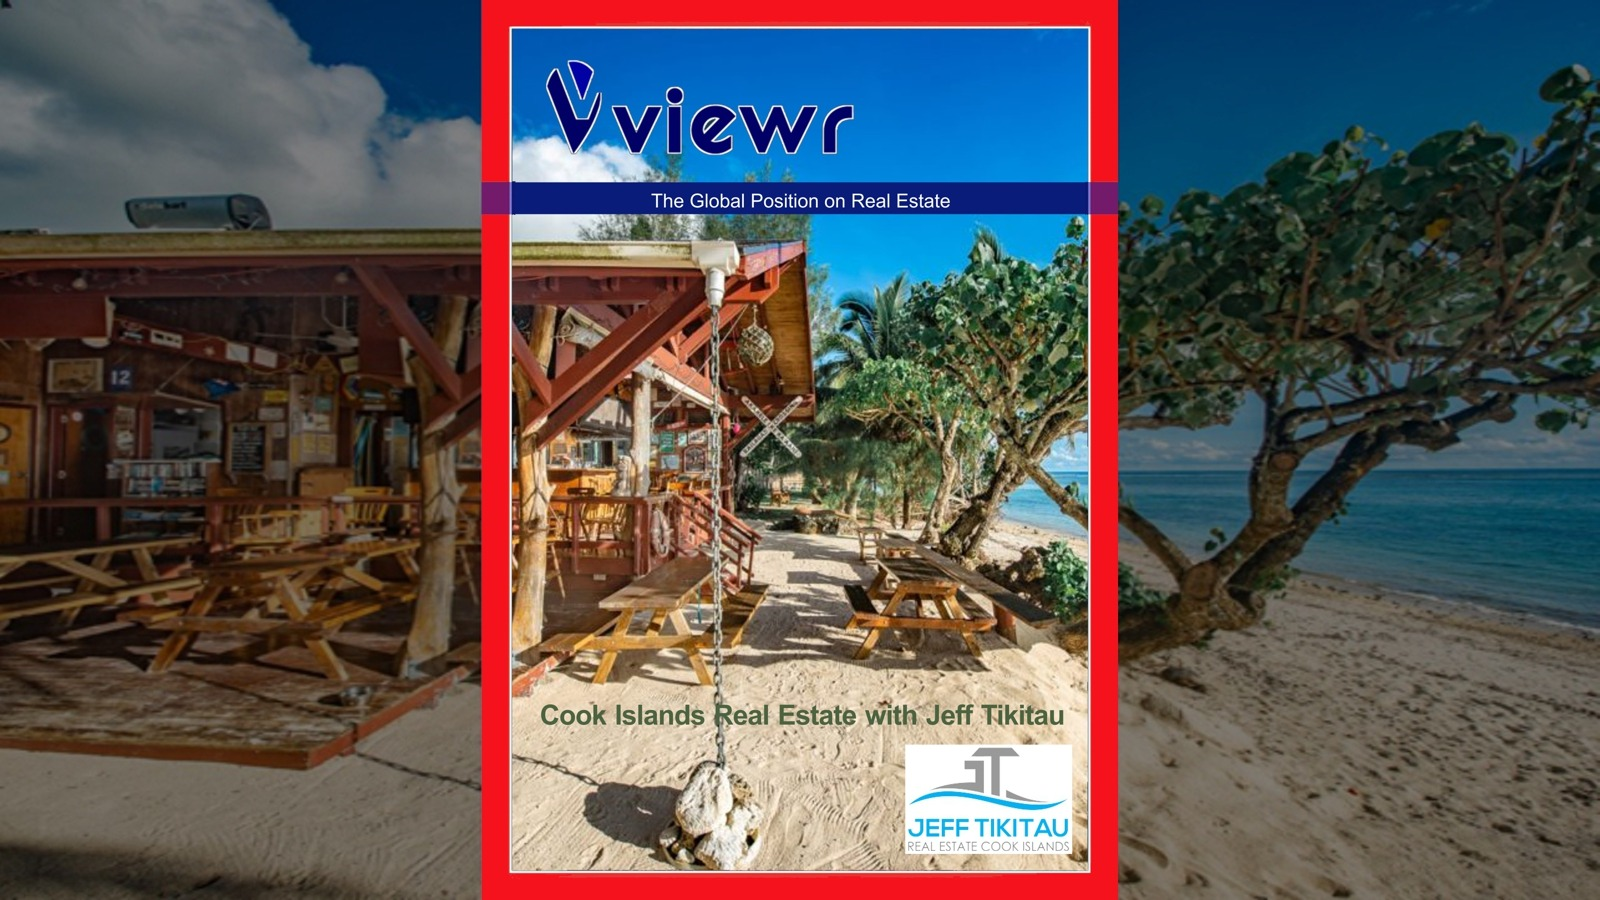 Global viewr Magazine Jeff Tikitau Cook Islands Real Estate